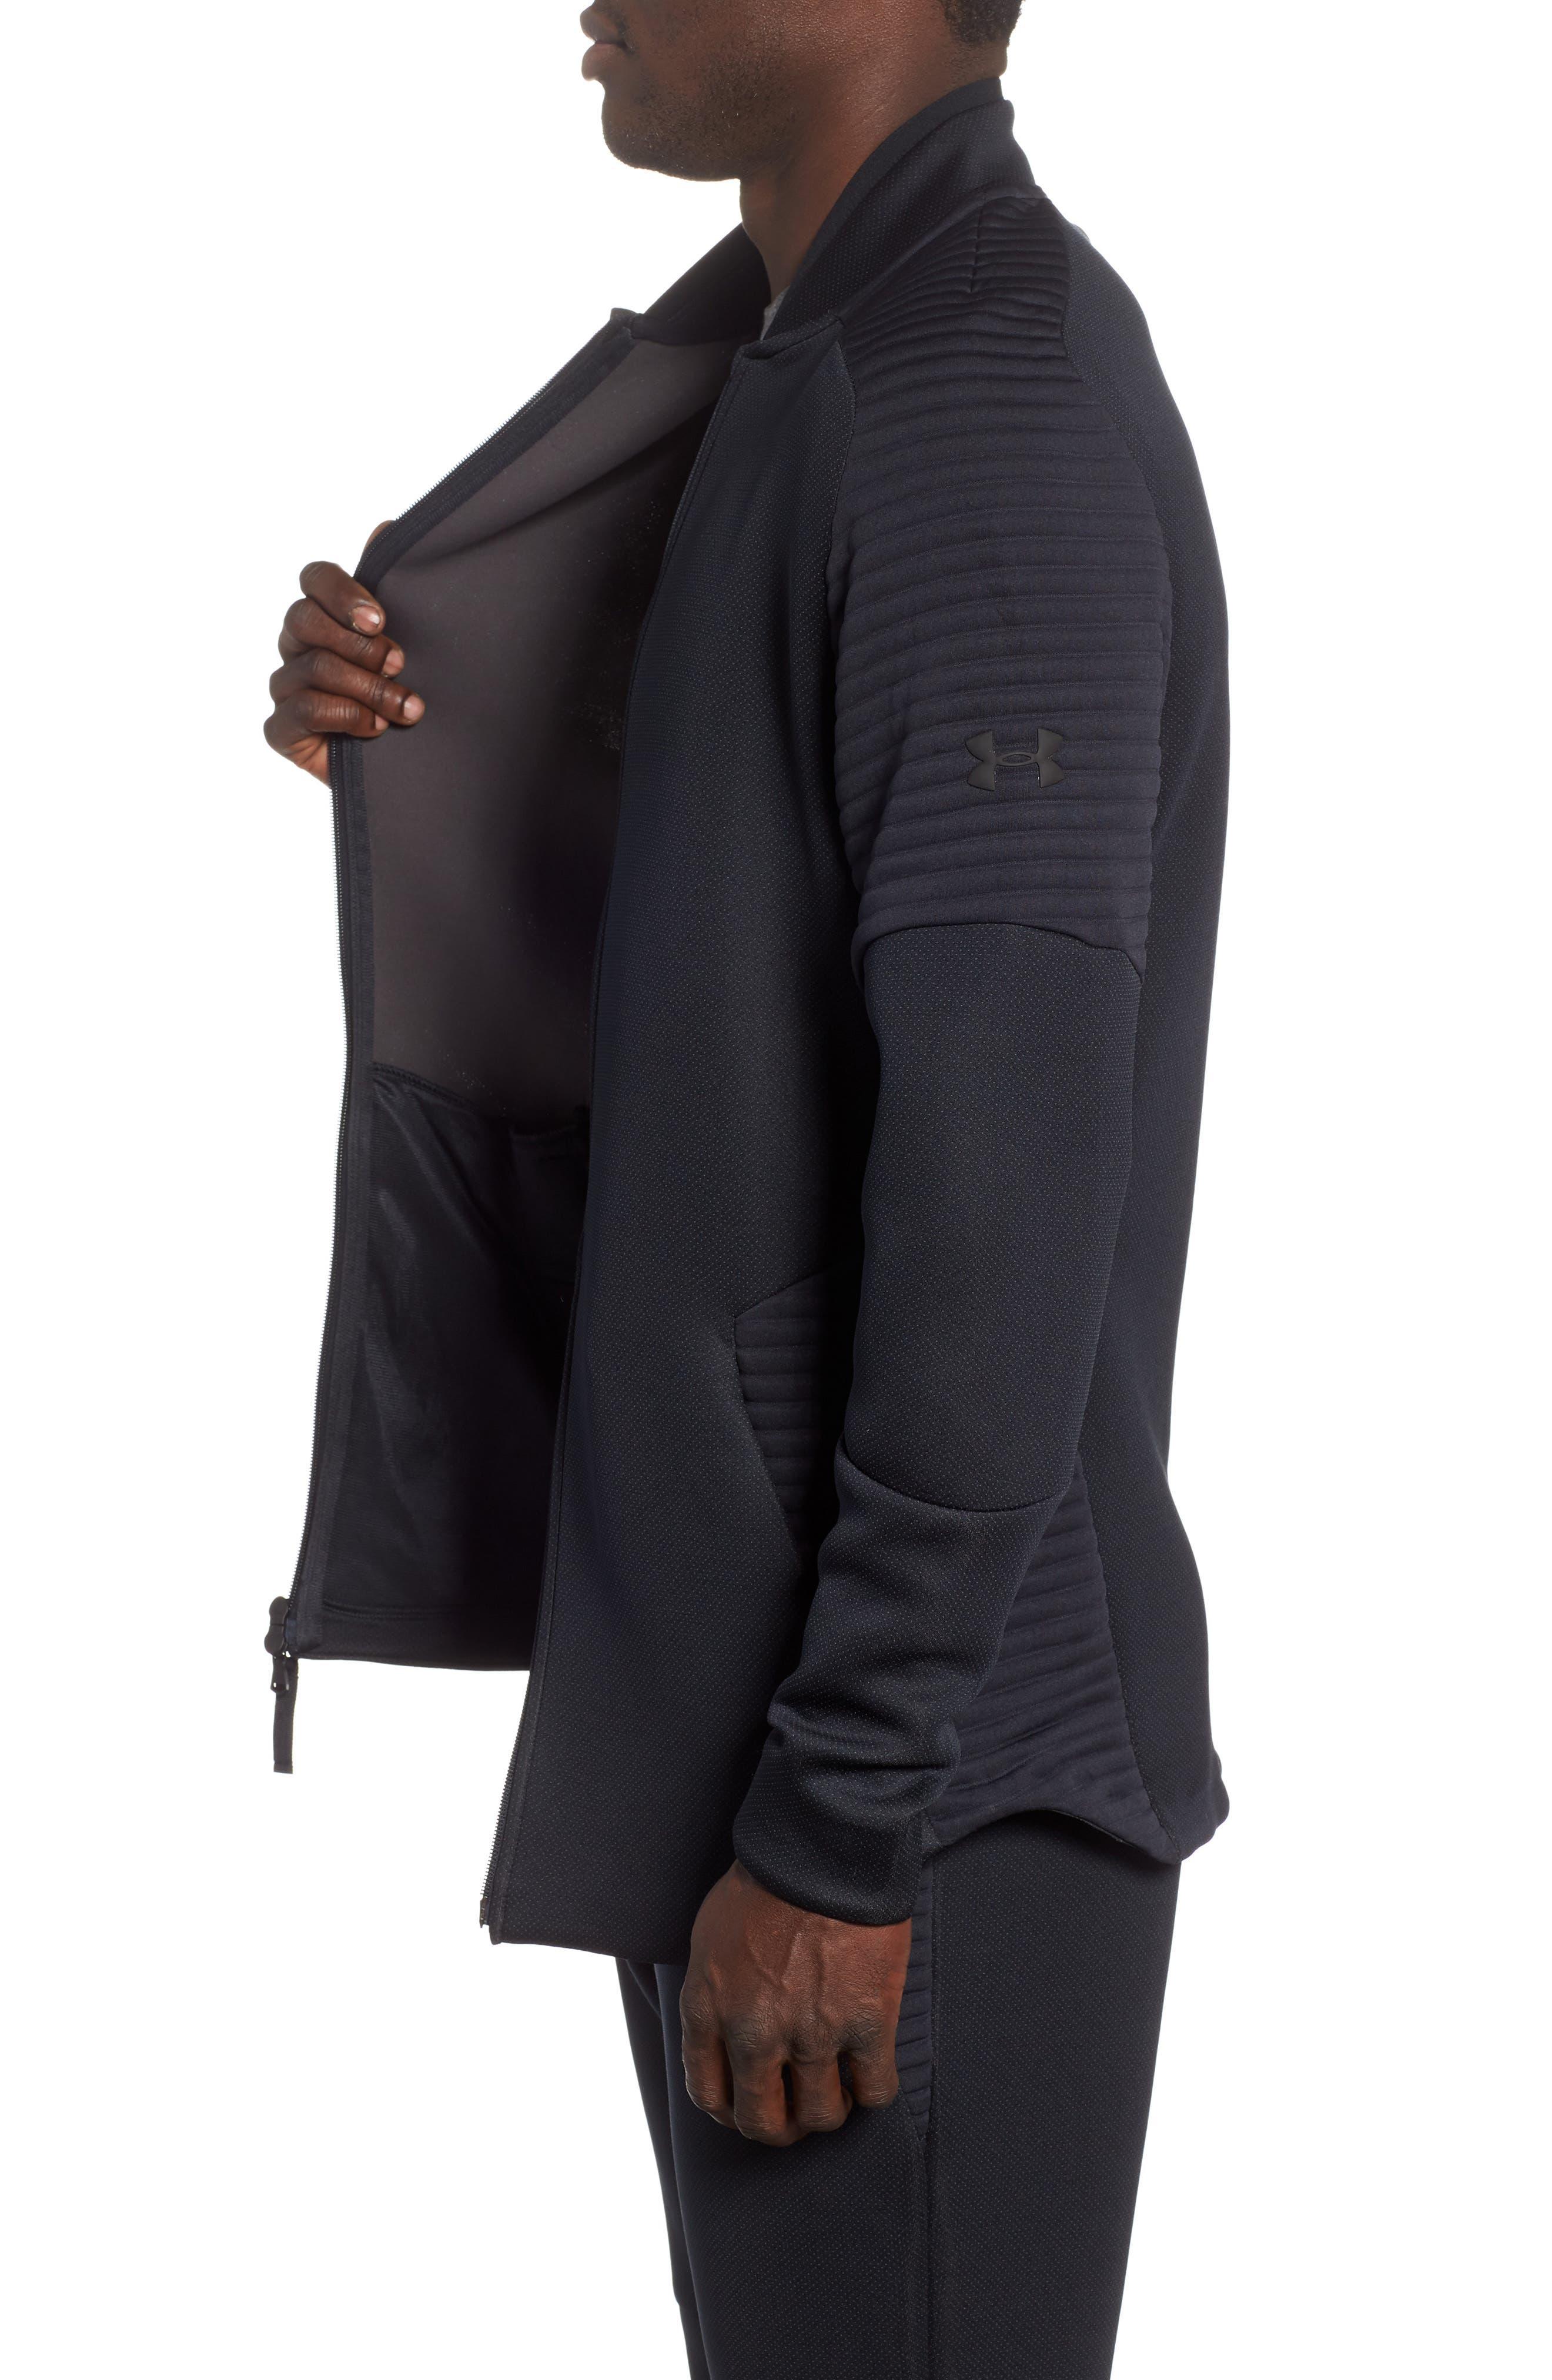 Unstoppable /MOVE Jacket,                             Alternate thumbnail 3, color,                             BLACK/ CHARCOAL/ BLACK